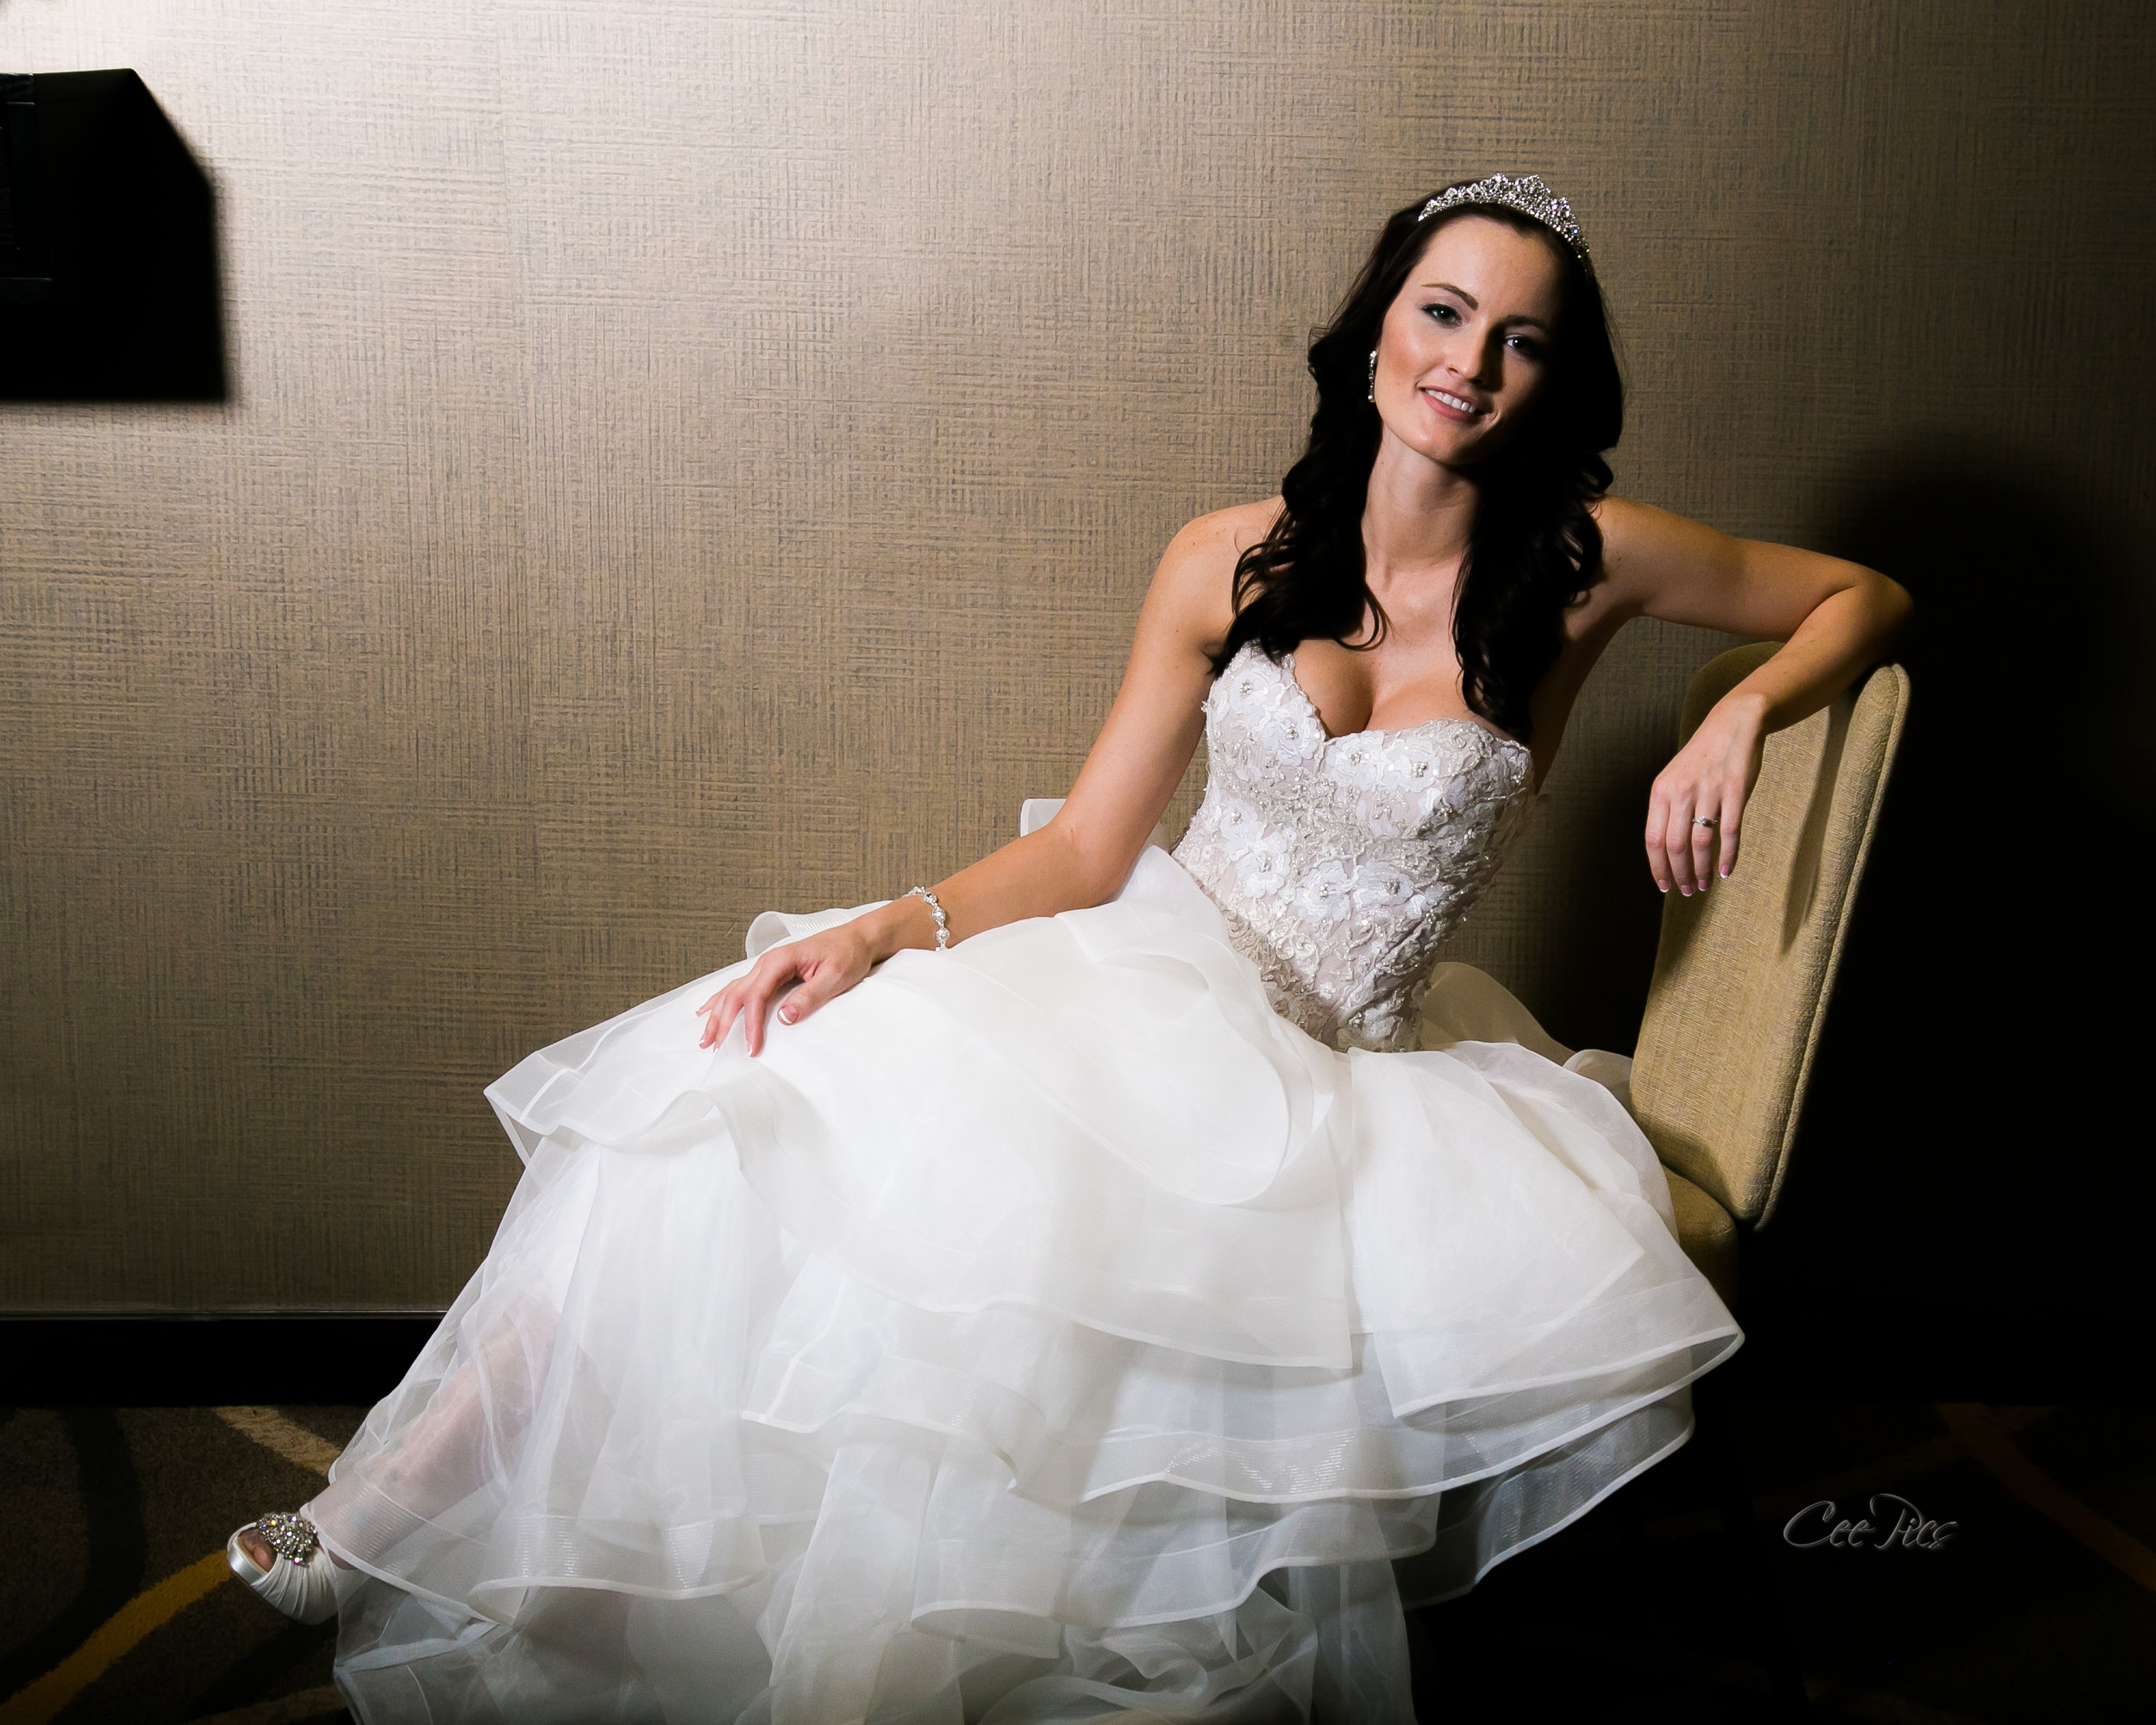 Nashville_Wedding_Photographer_Photography_DJ_MC_Lighting_Photobooth_Franklin_Bowling_Gallatin-51.jpg